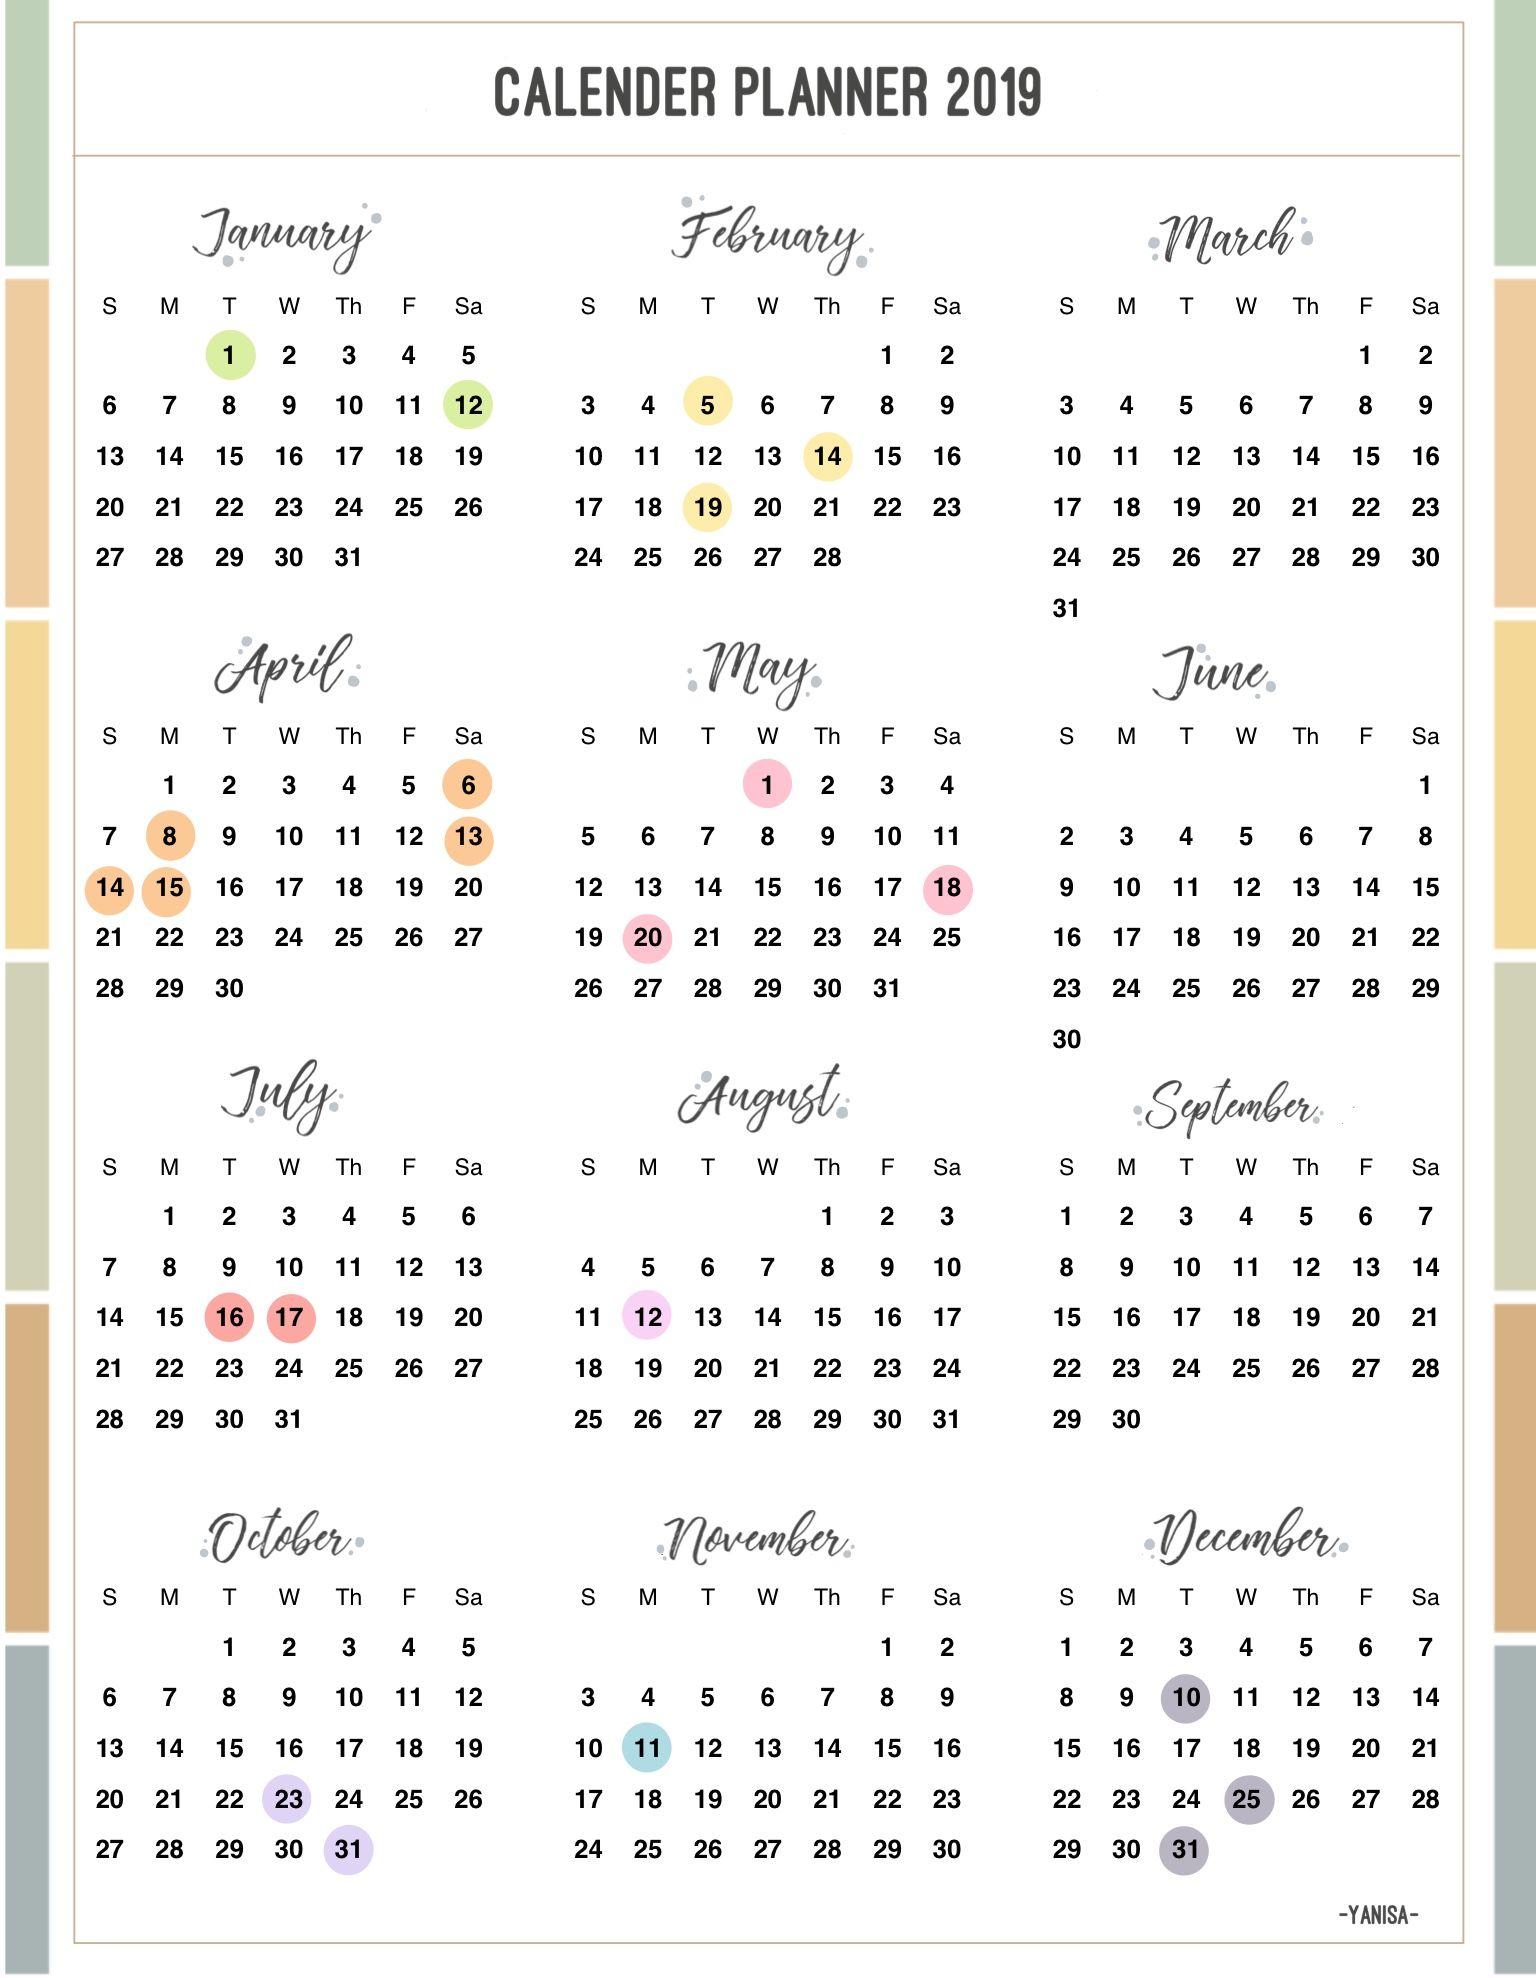 Calendario Juliano 2020  Kolon.geologypu throughout 2018 Julian Calendar Quadax